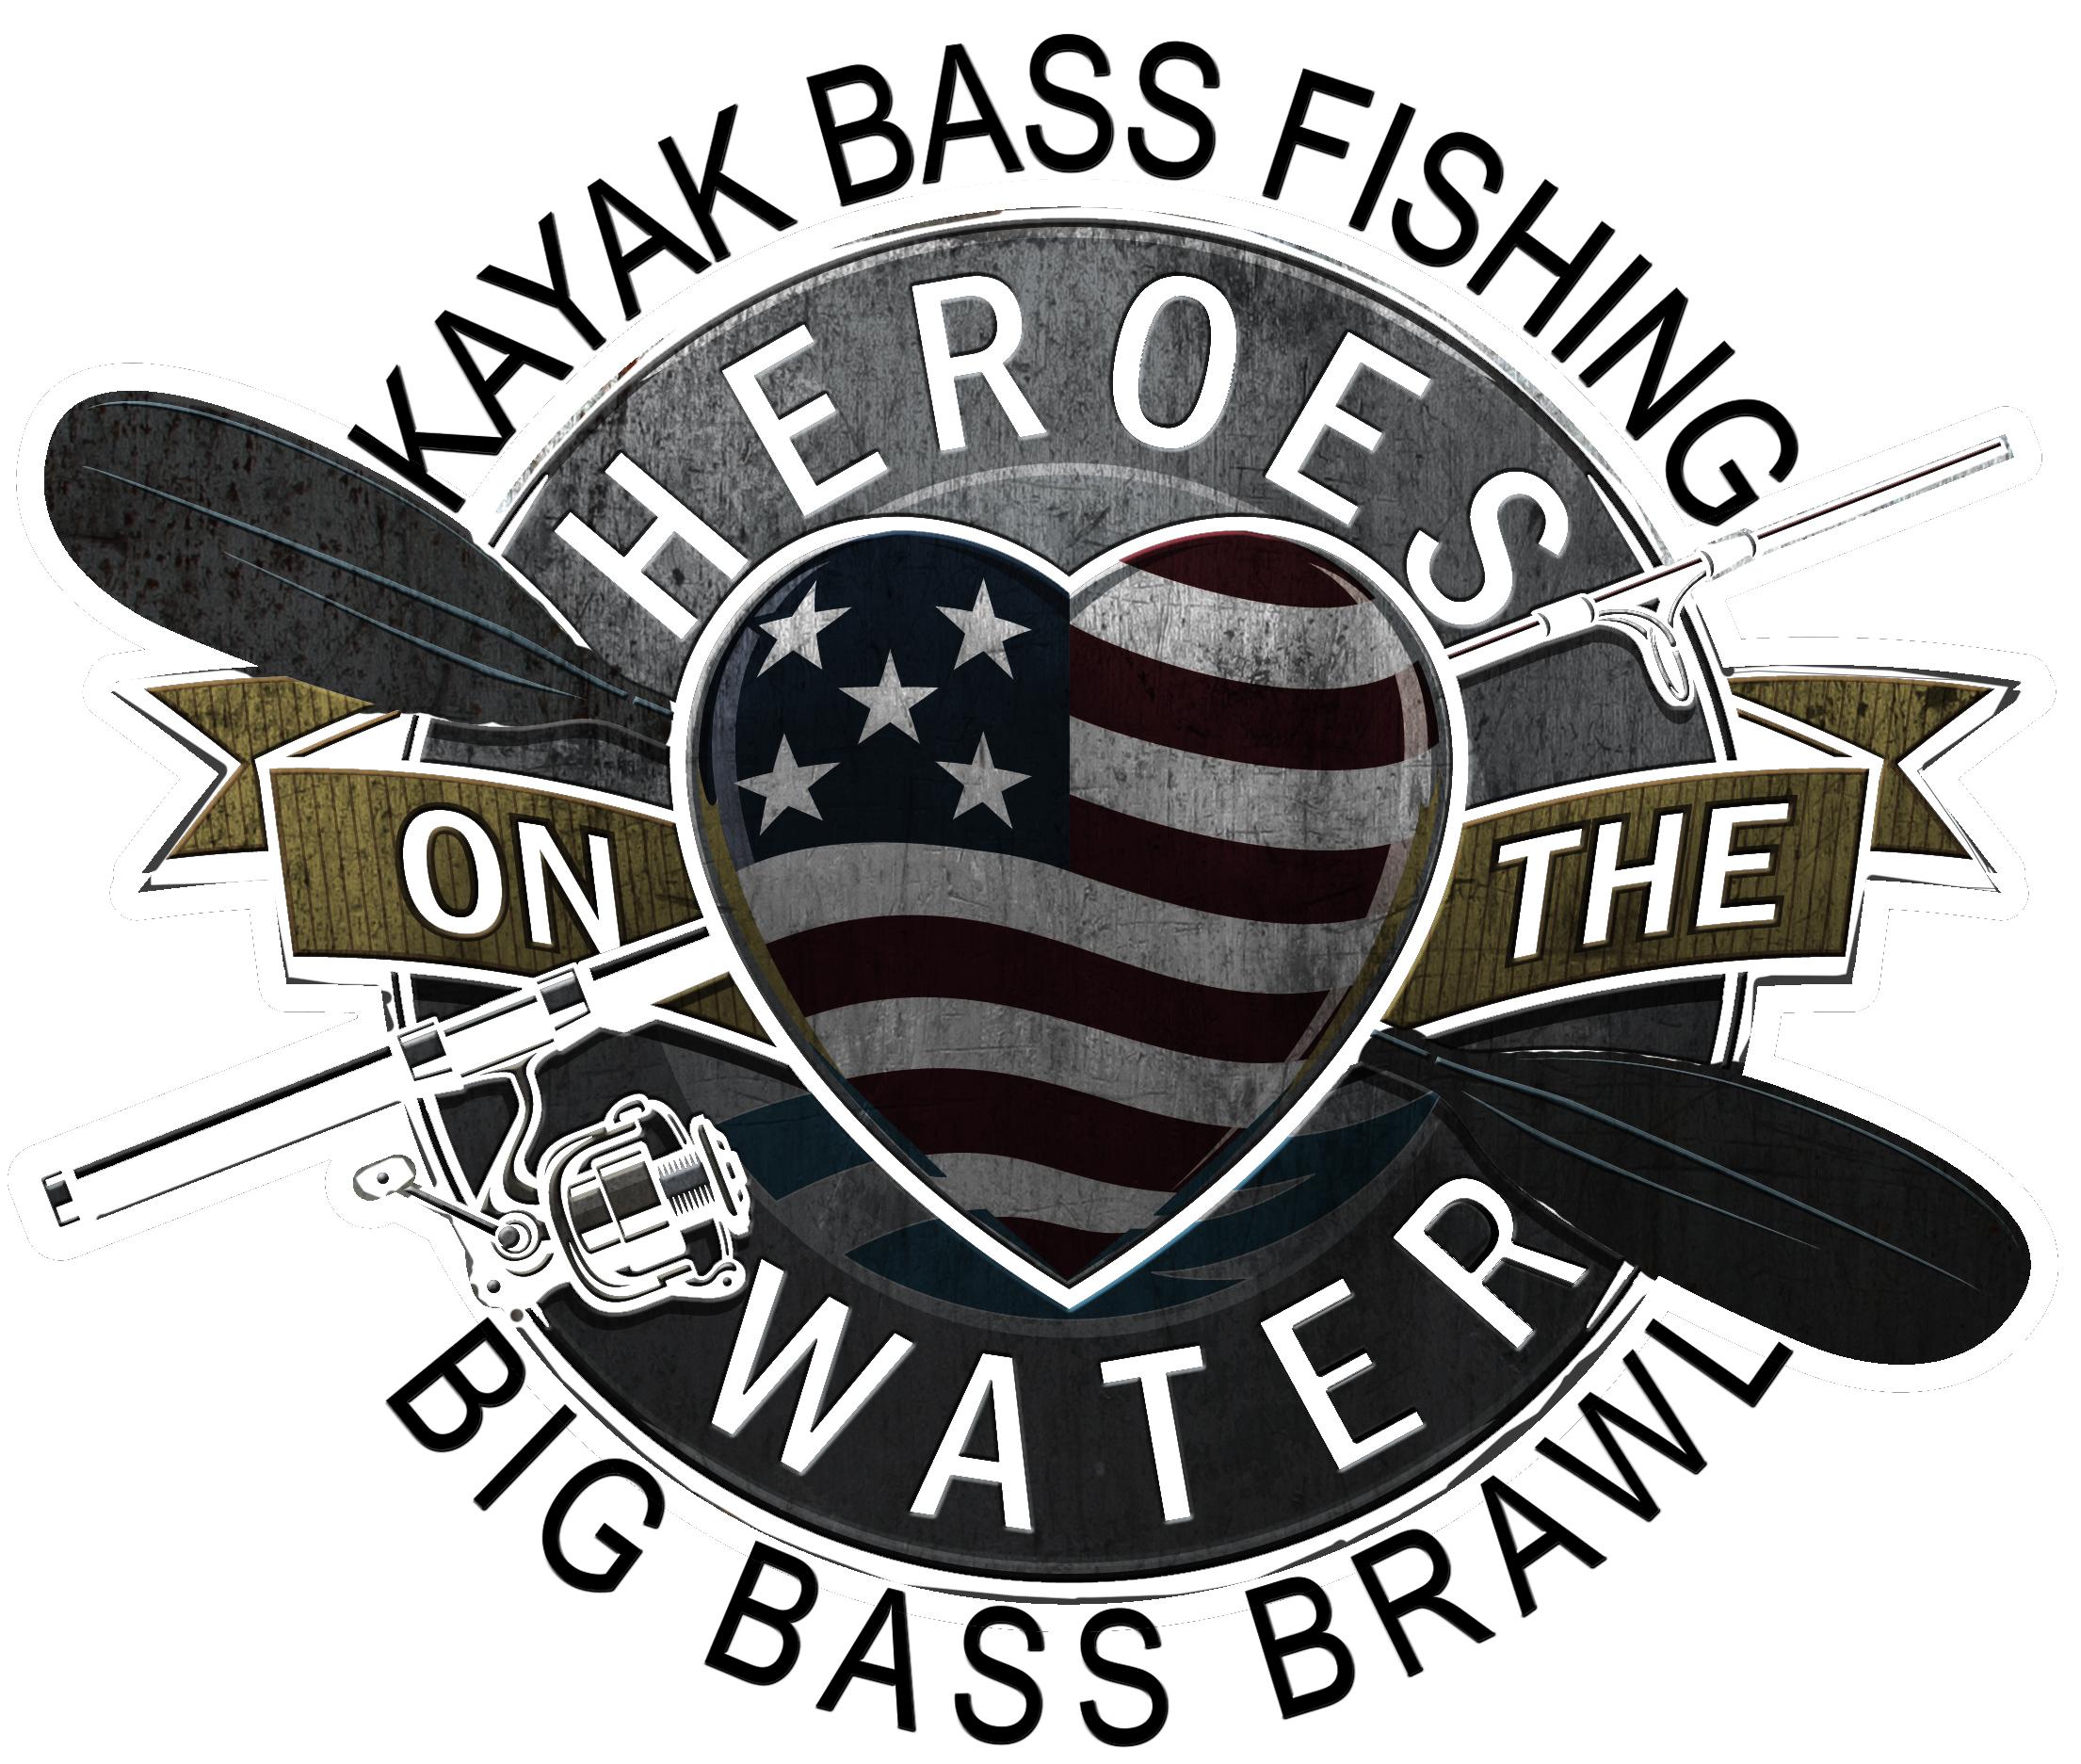 KBF HOW Big Bass Brawl - Old Hickory